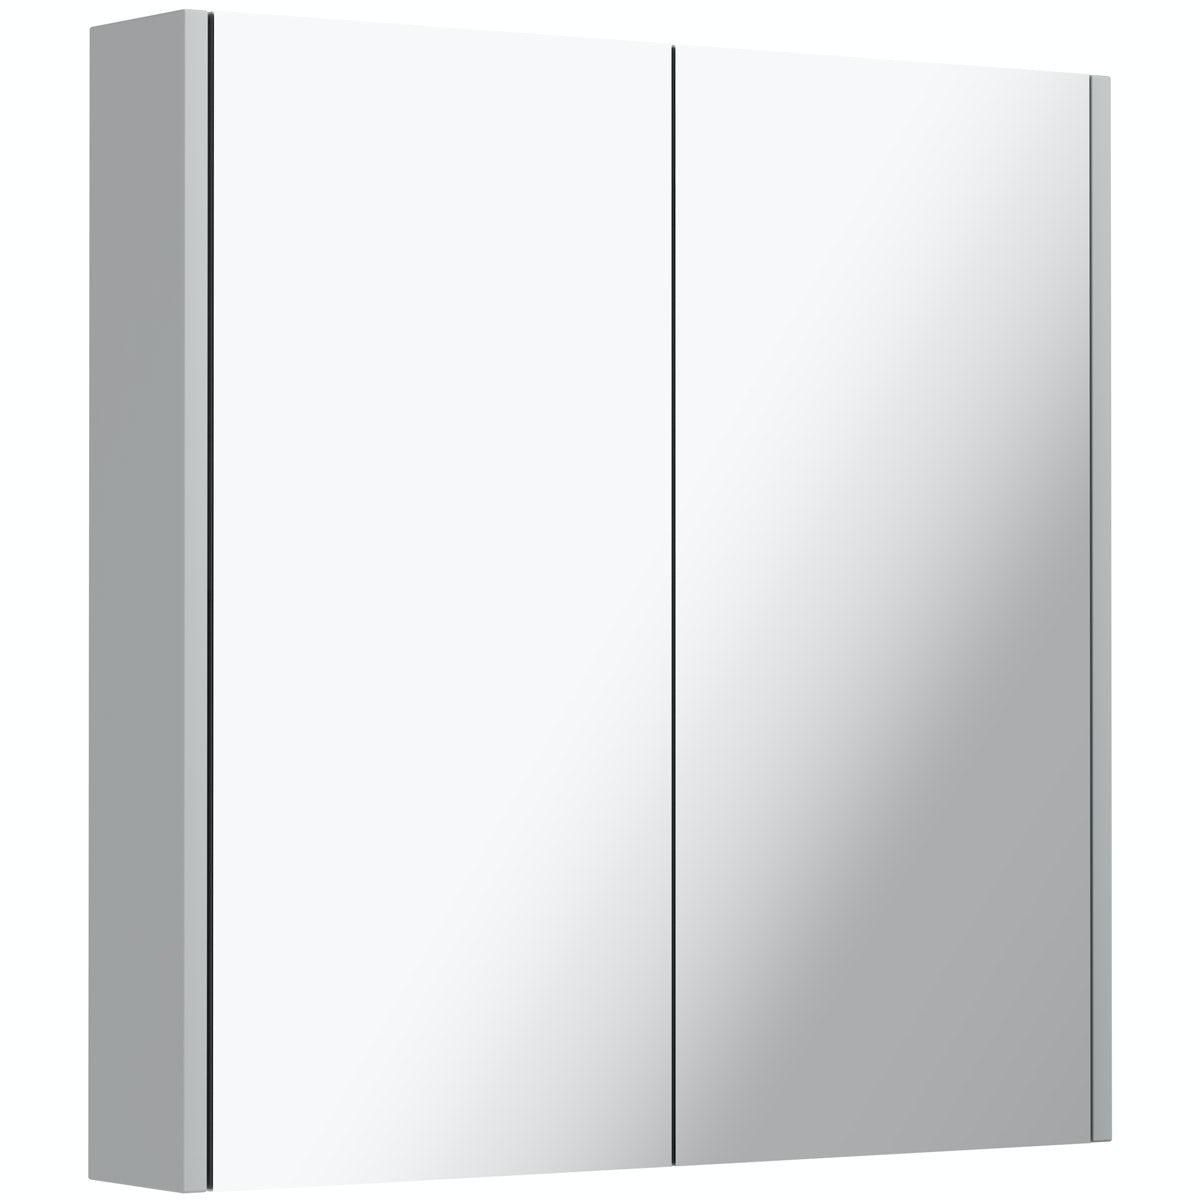 Clarity satin grey mirror cabinet 600mm